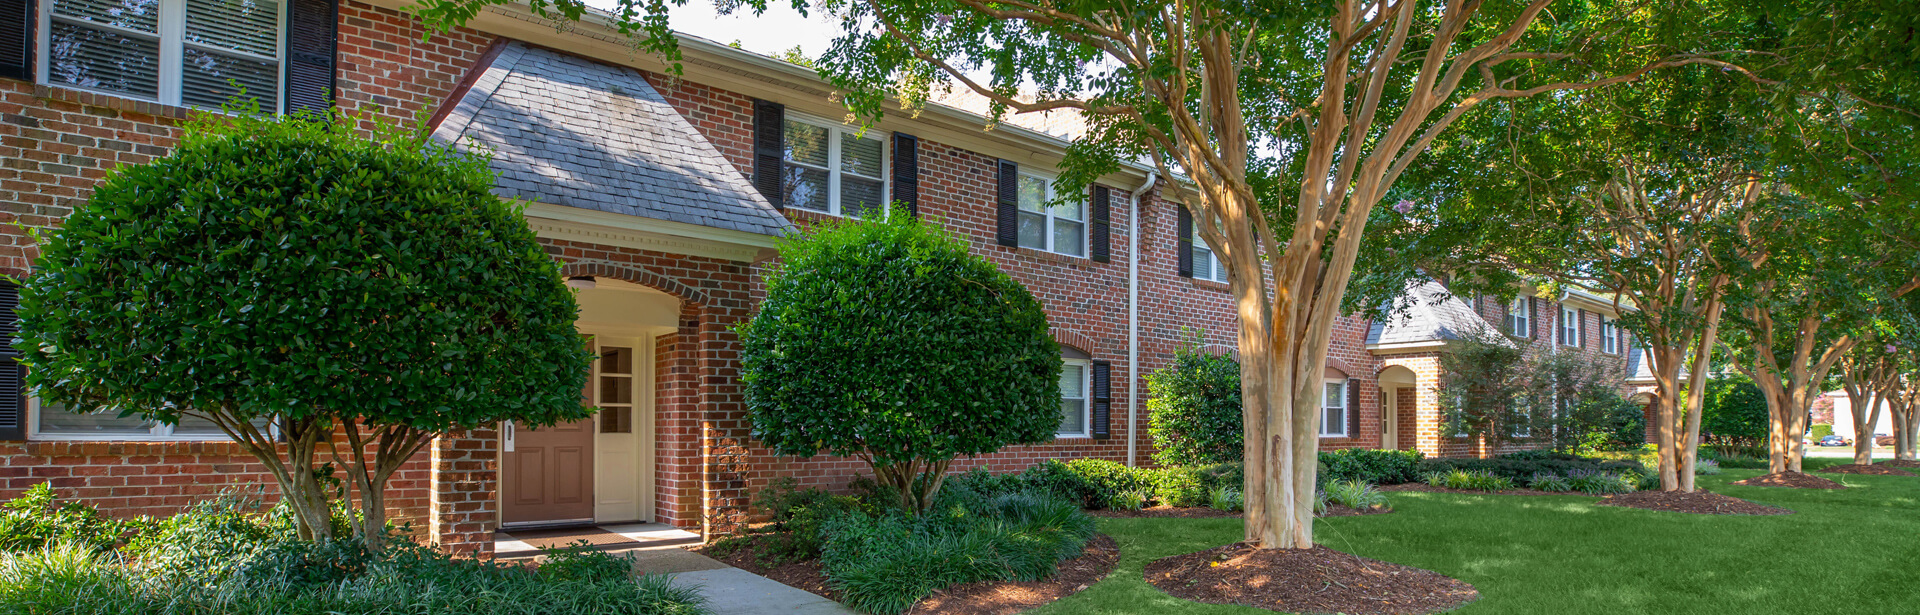 Virginia Beach Apartments For Rent: Apartment Homes In Virginia